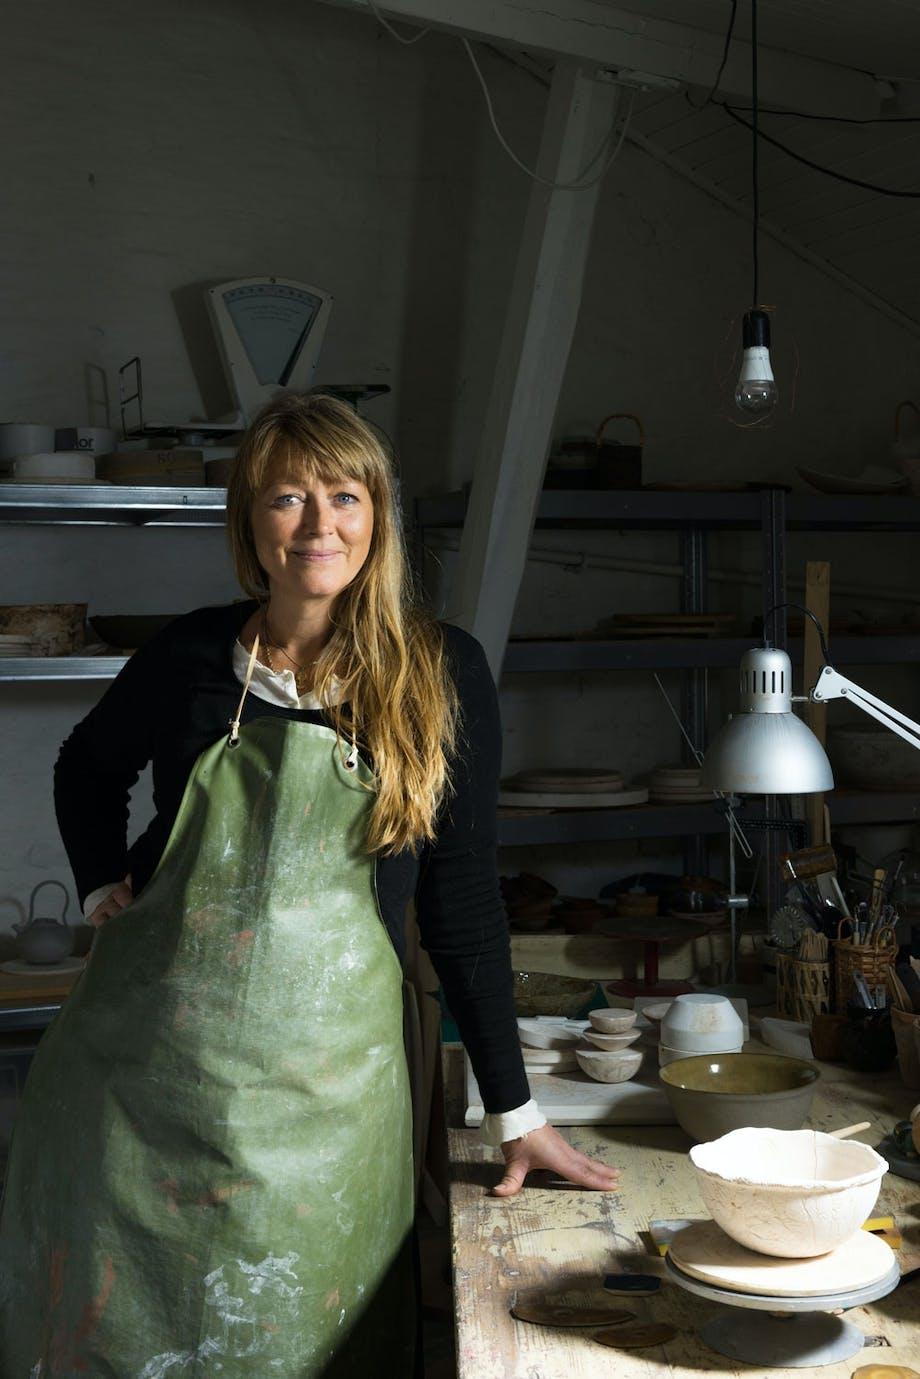 keramiker Ragnhild Wik i keramikkverkstedet sitt